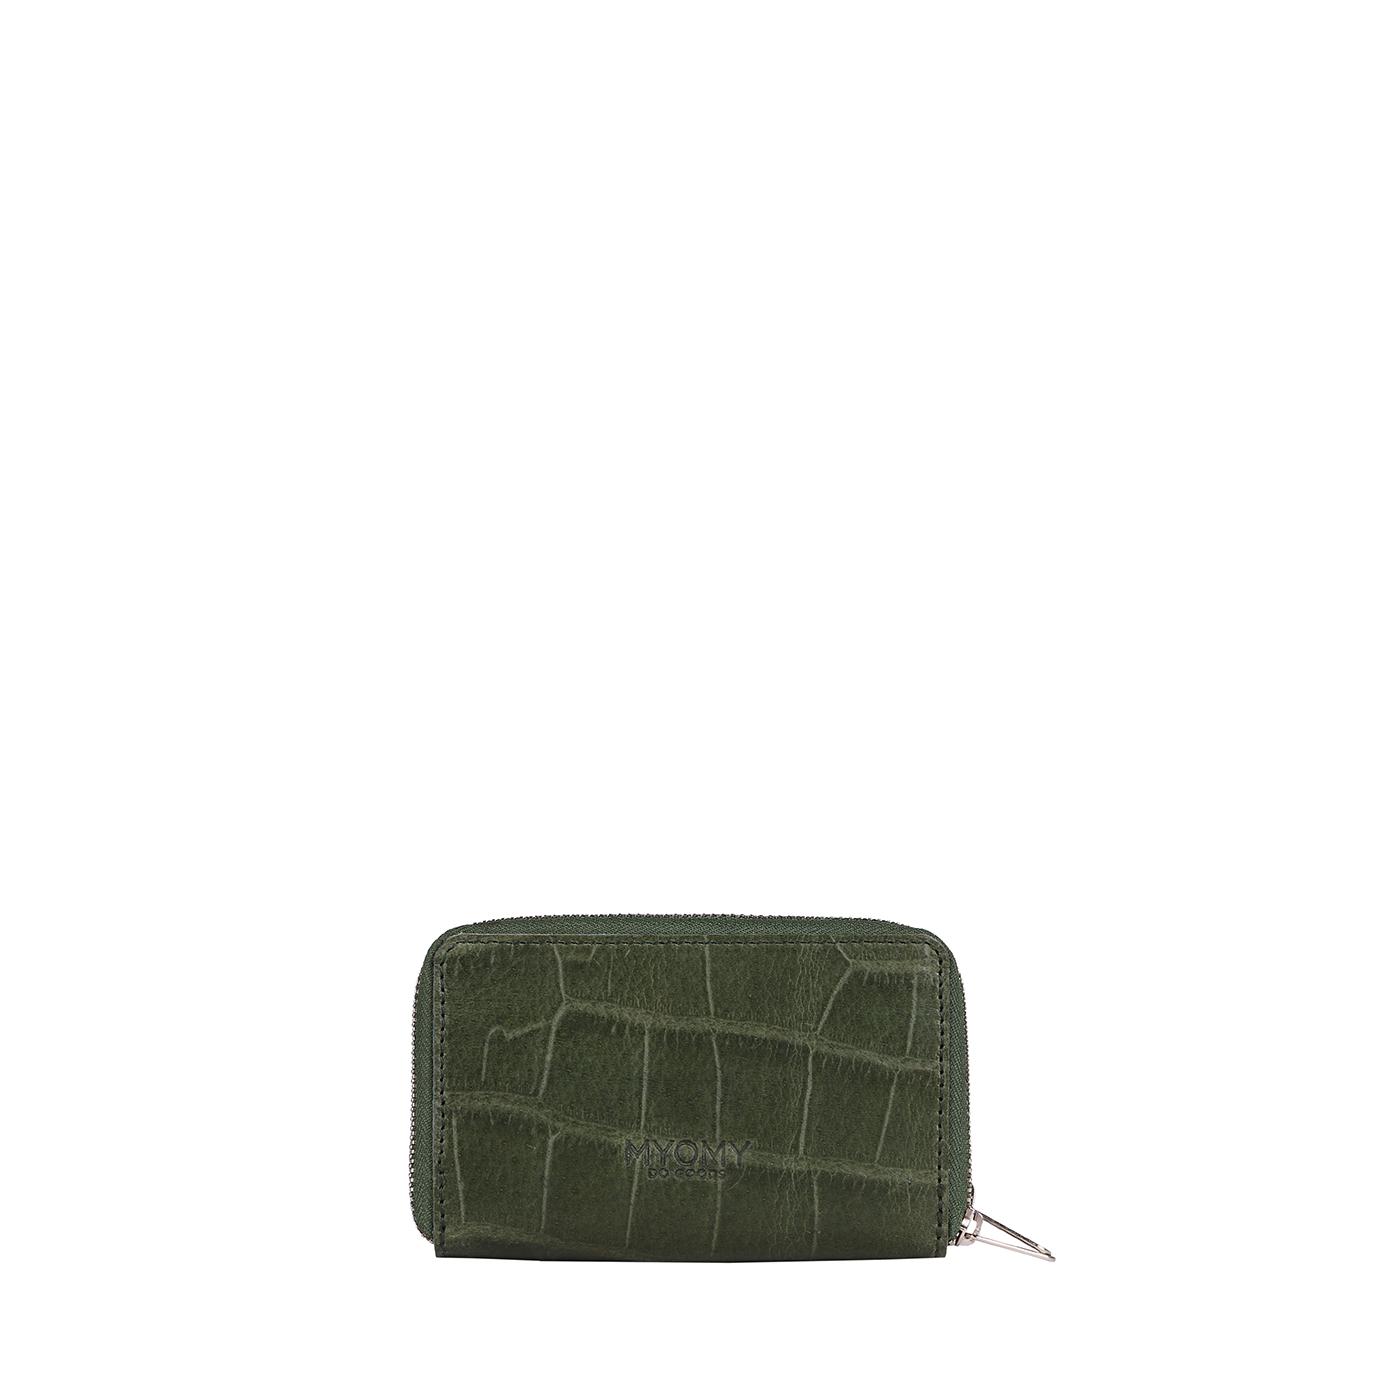 MY PAPER BAG Wallet Medium (RFID) - croco vetiver green